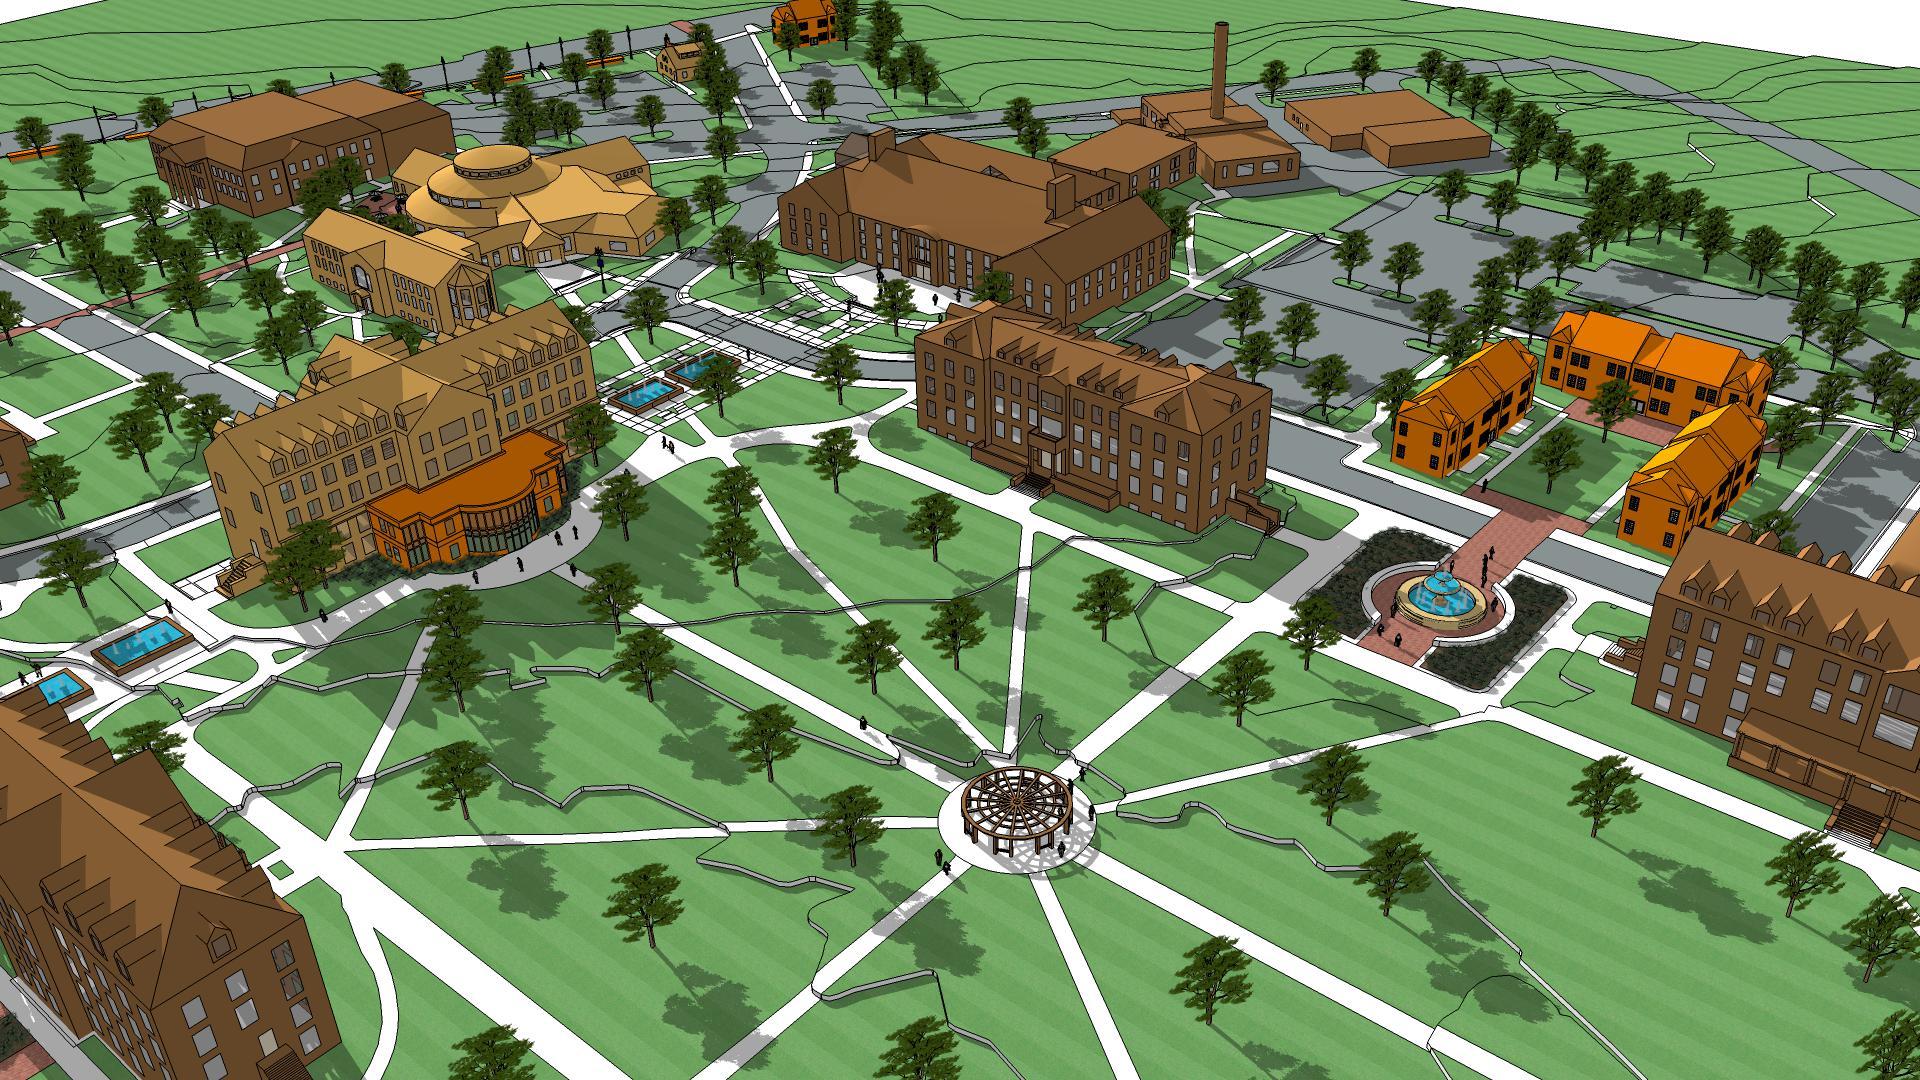 Hood College Campus Master Plan